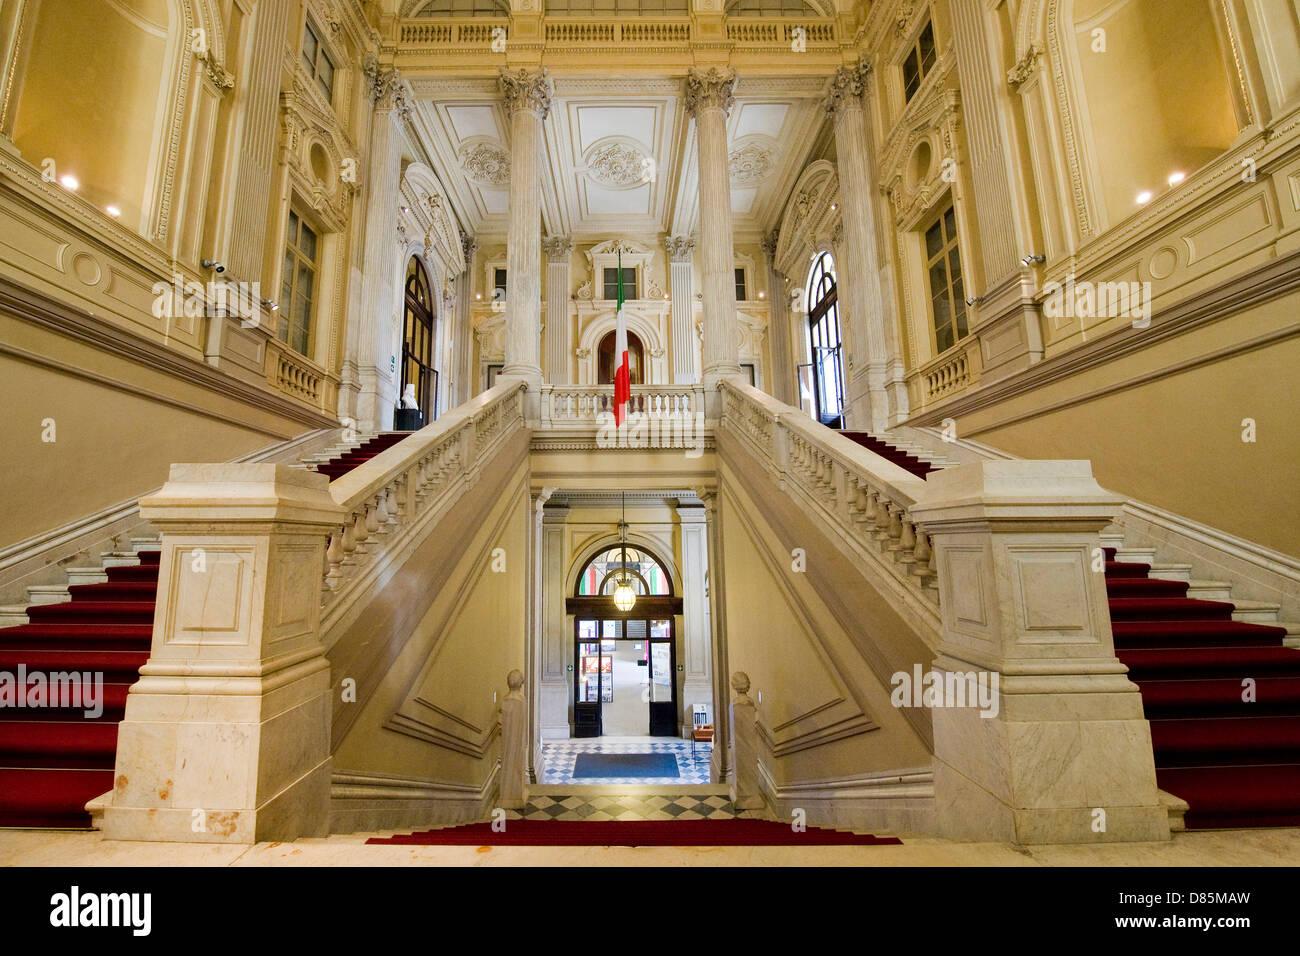 Italy Piedmont Turin Carignano palace National Museum of the Italian Risorgimento - Stock Image